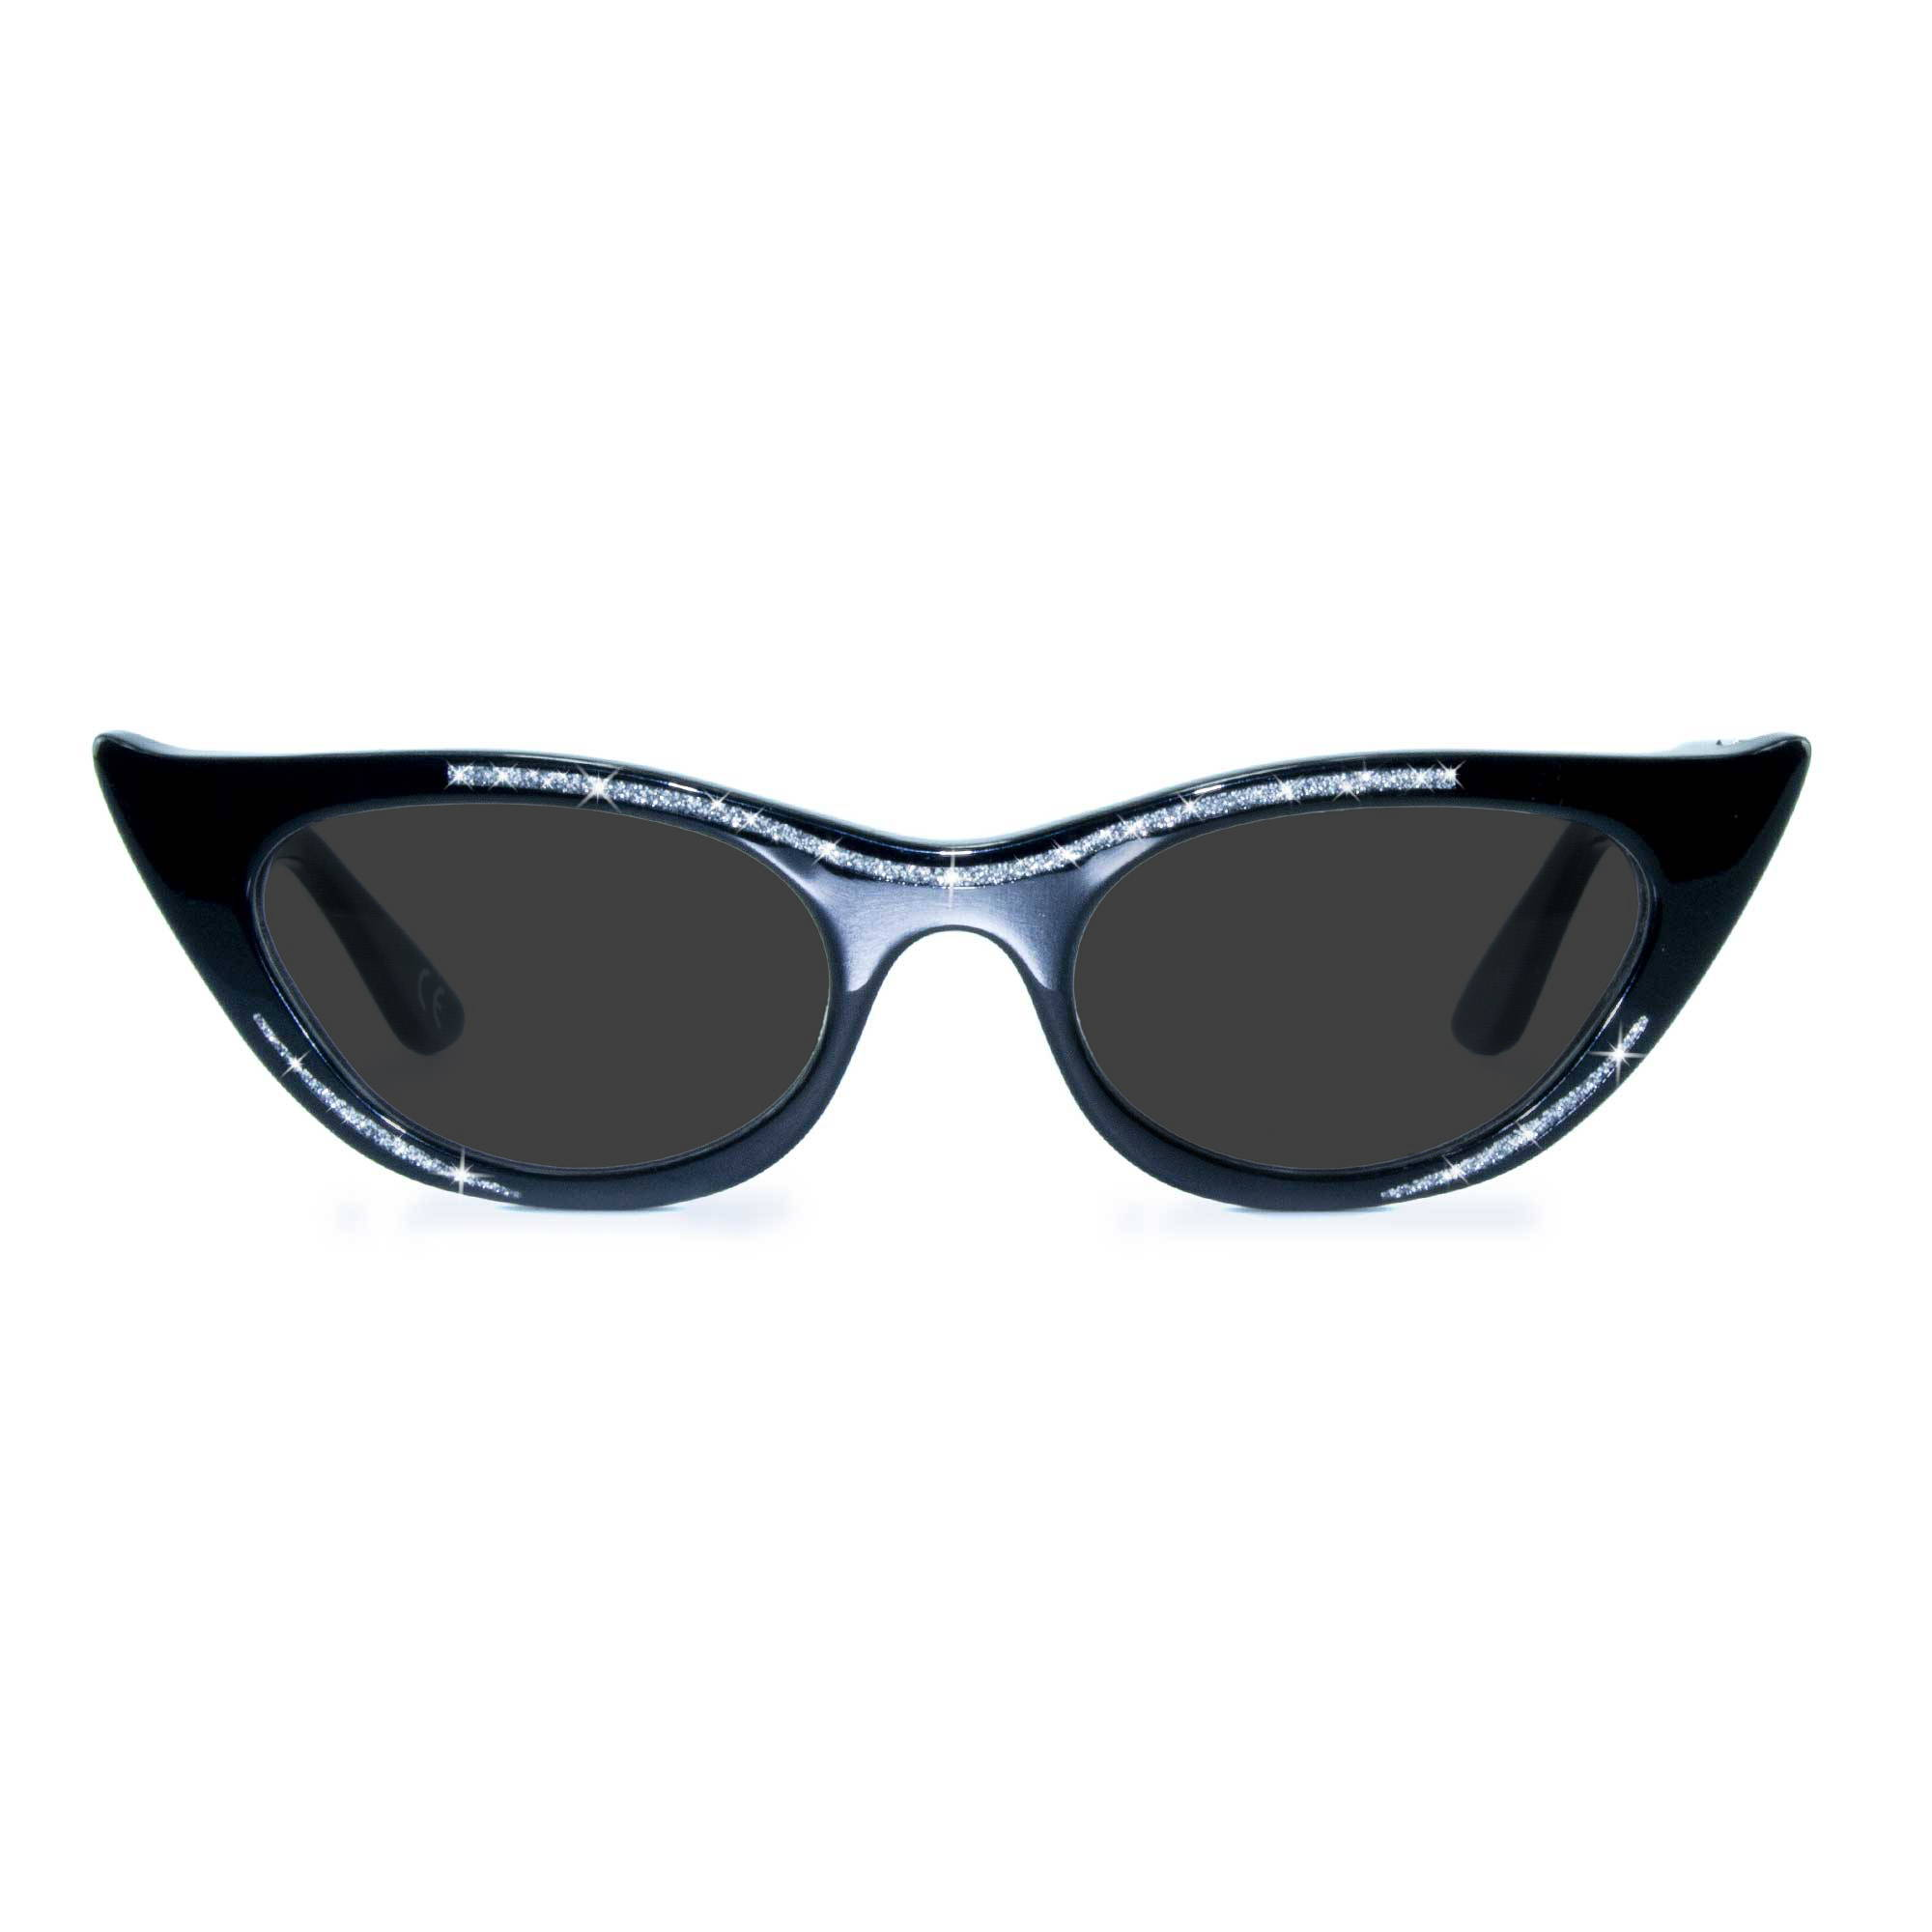 Joiuss lana black cat eye sunglasses